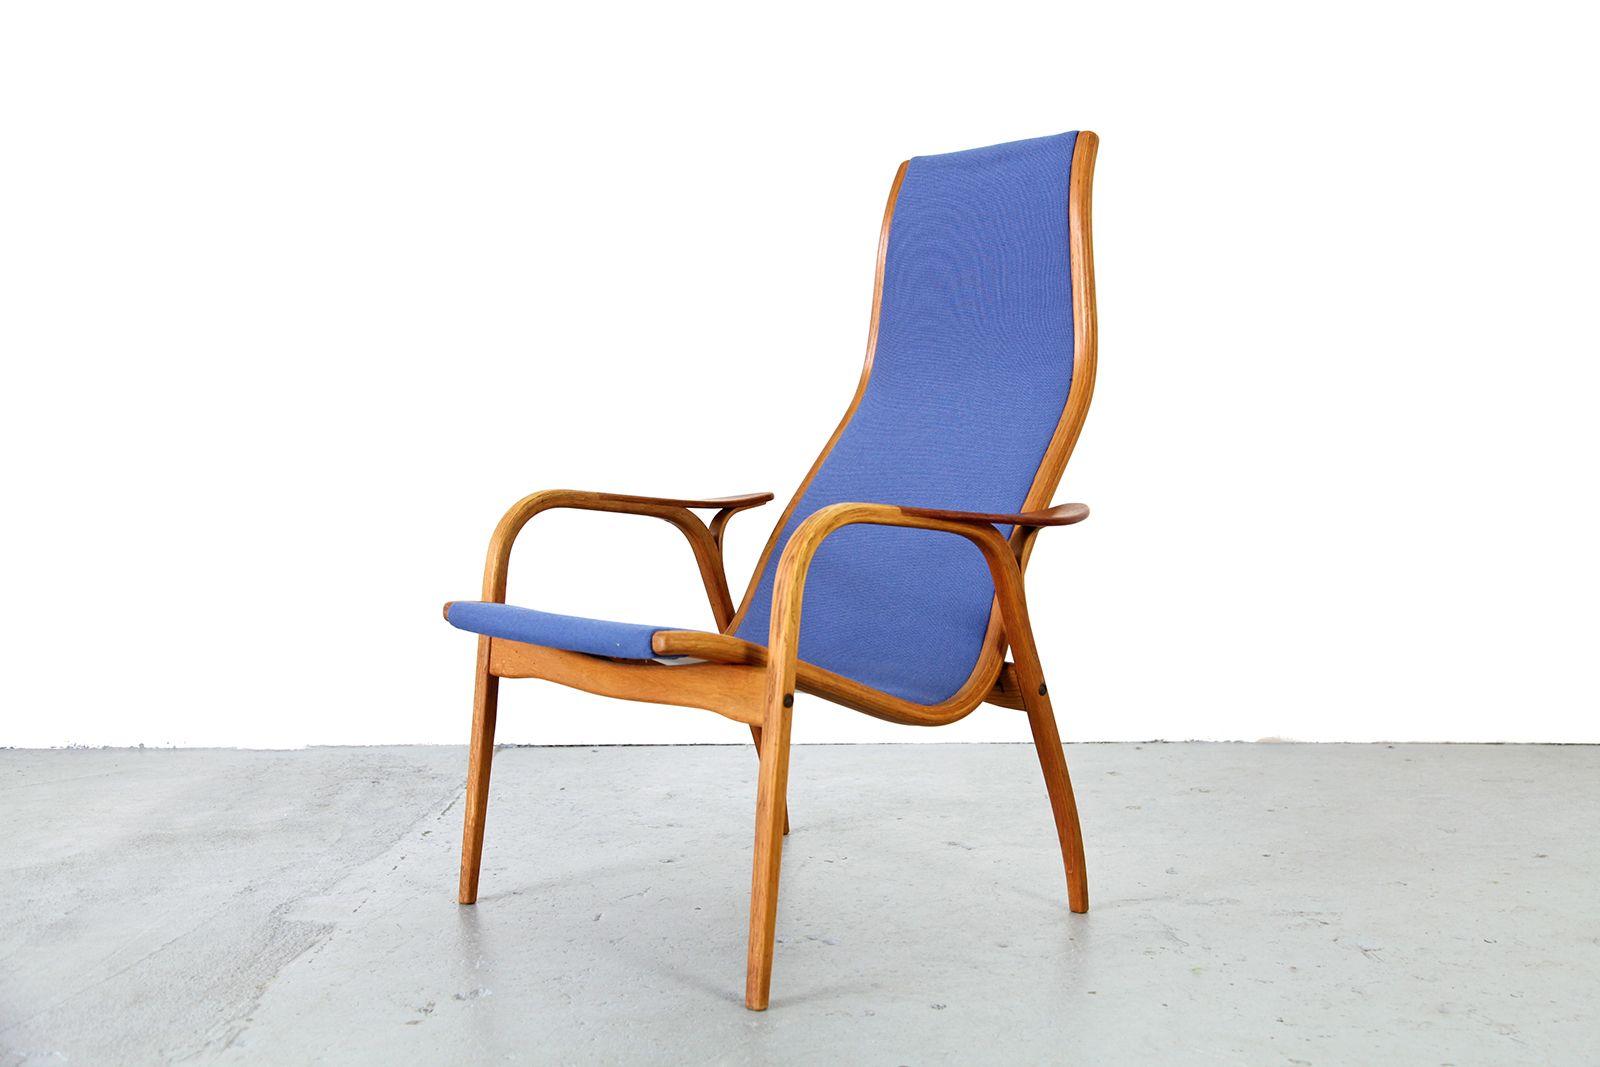 Lamino Lounge Sessel von Yngve Ekström für Swedese bei Pamono ka